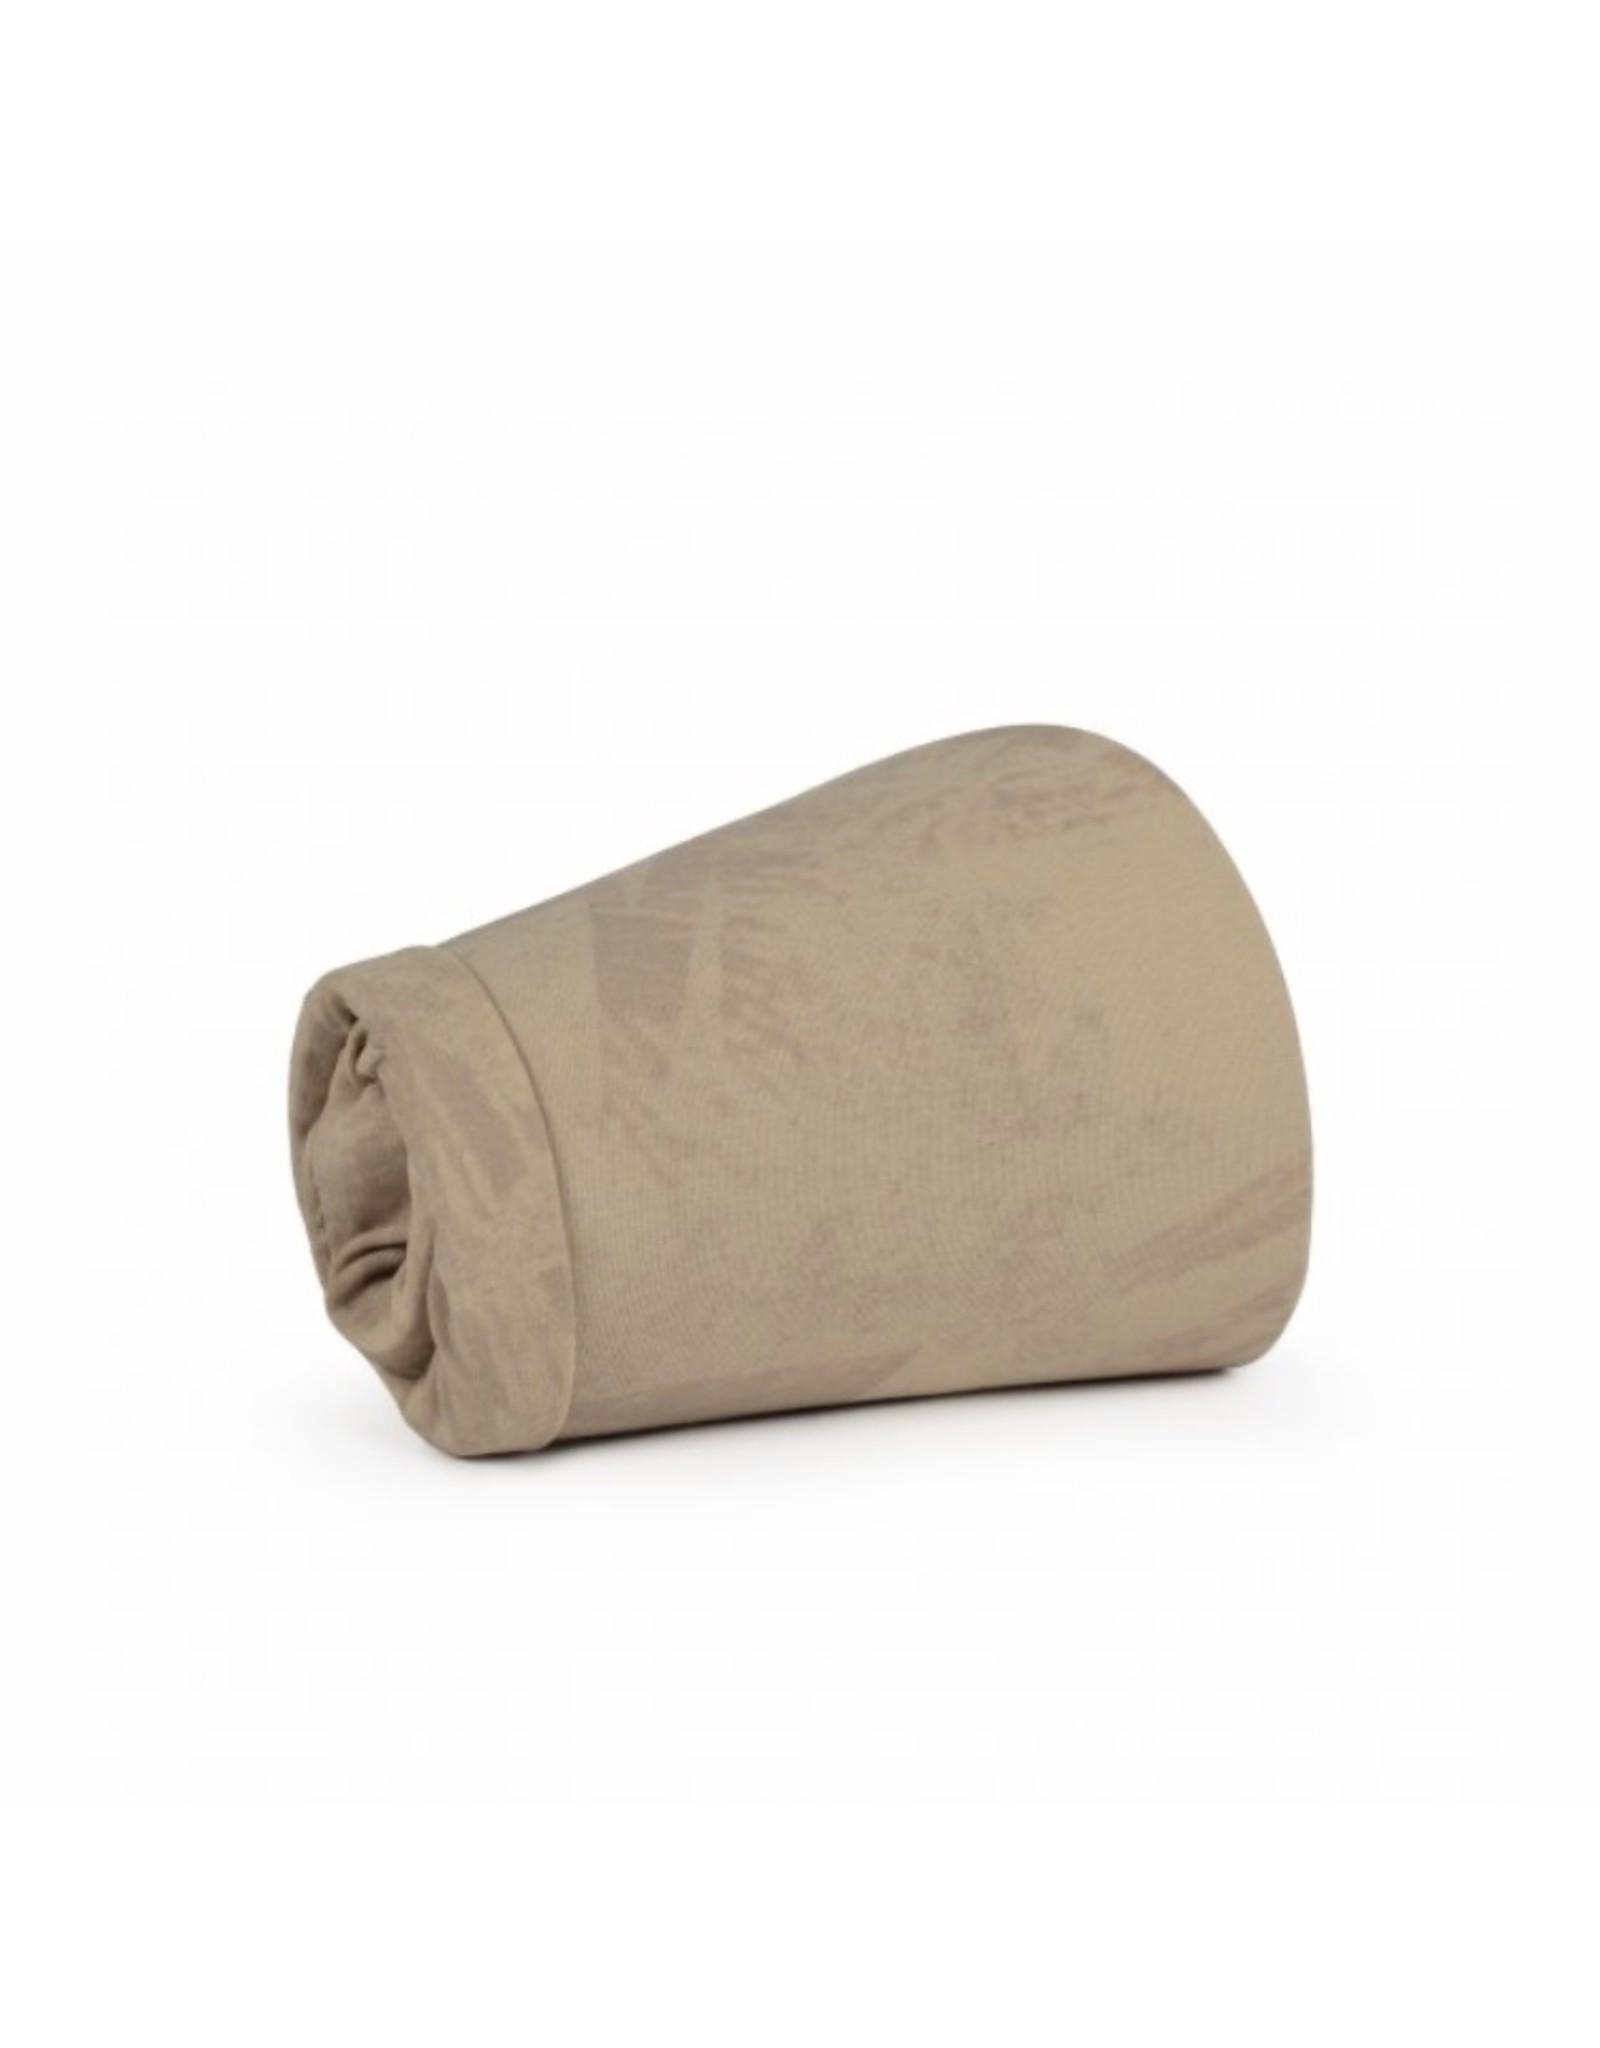 Buff Buff Pack Sahara Cap Açai Sand L/XL